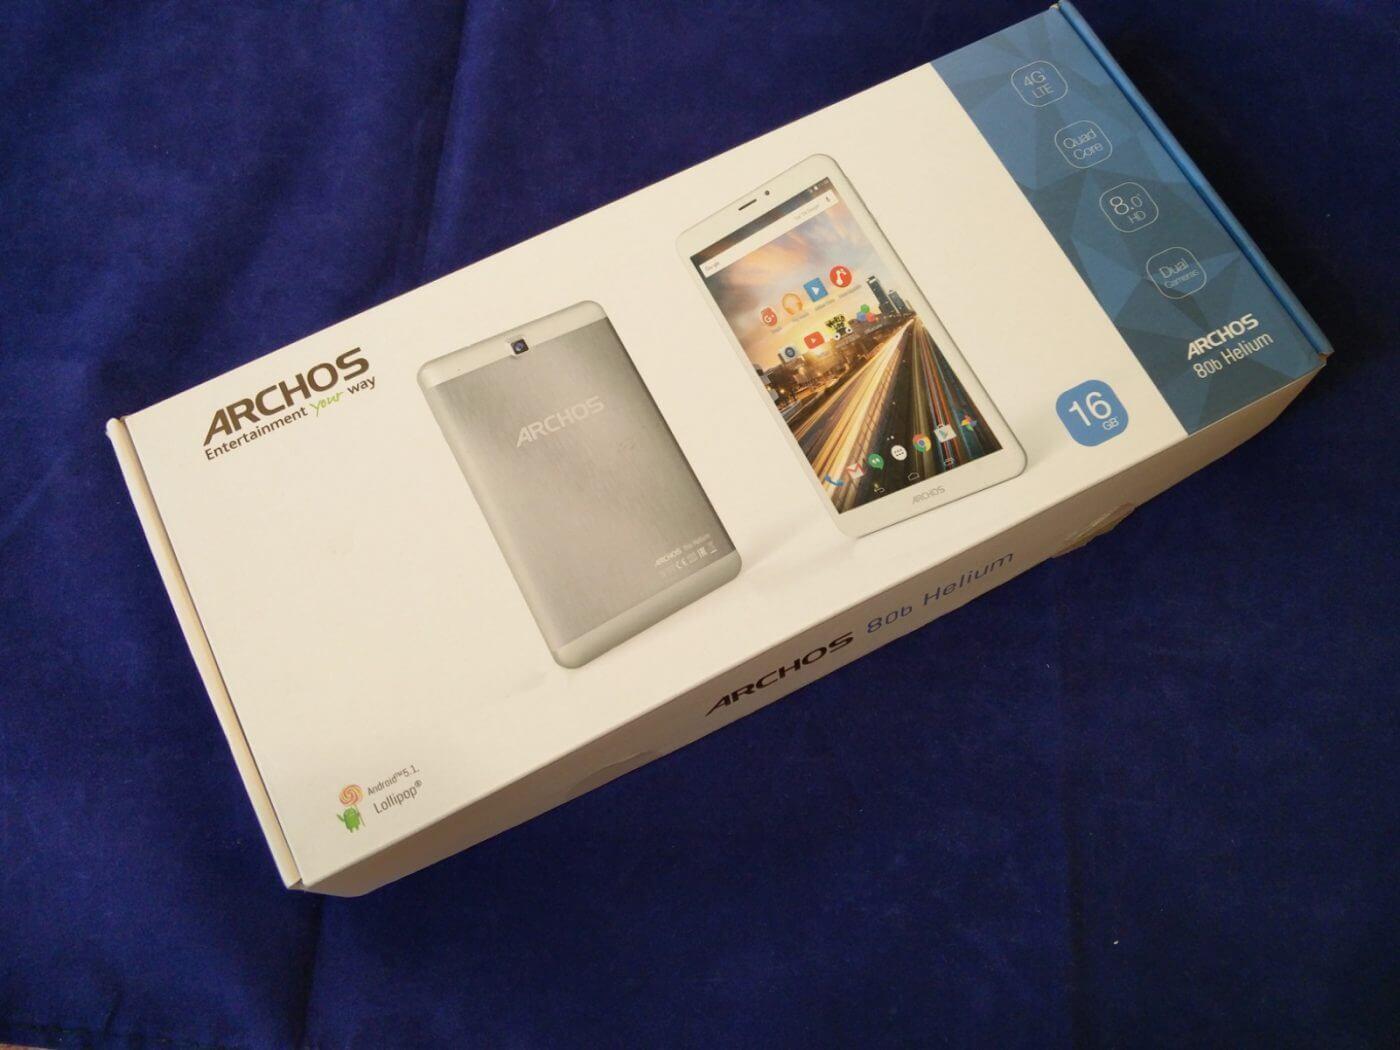 Archos 80b Helium Tablet Box